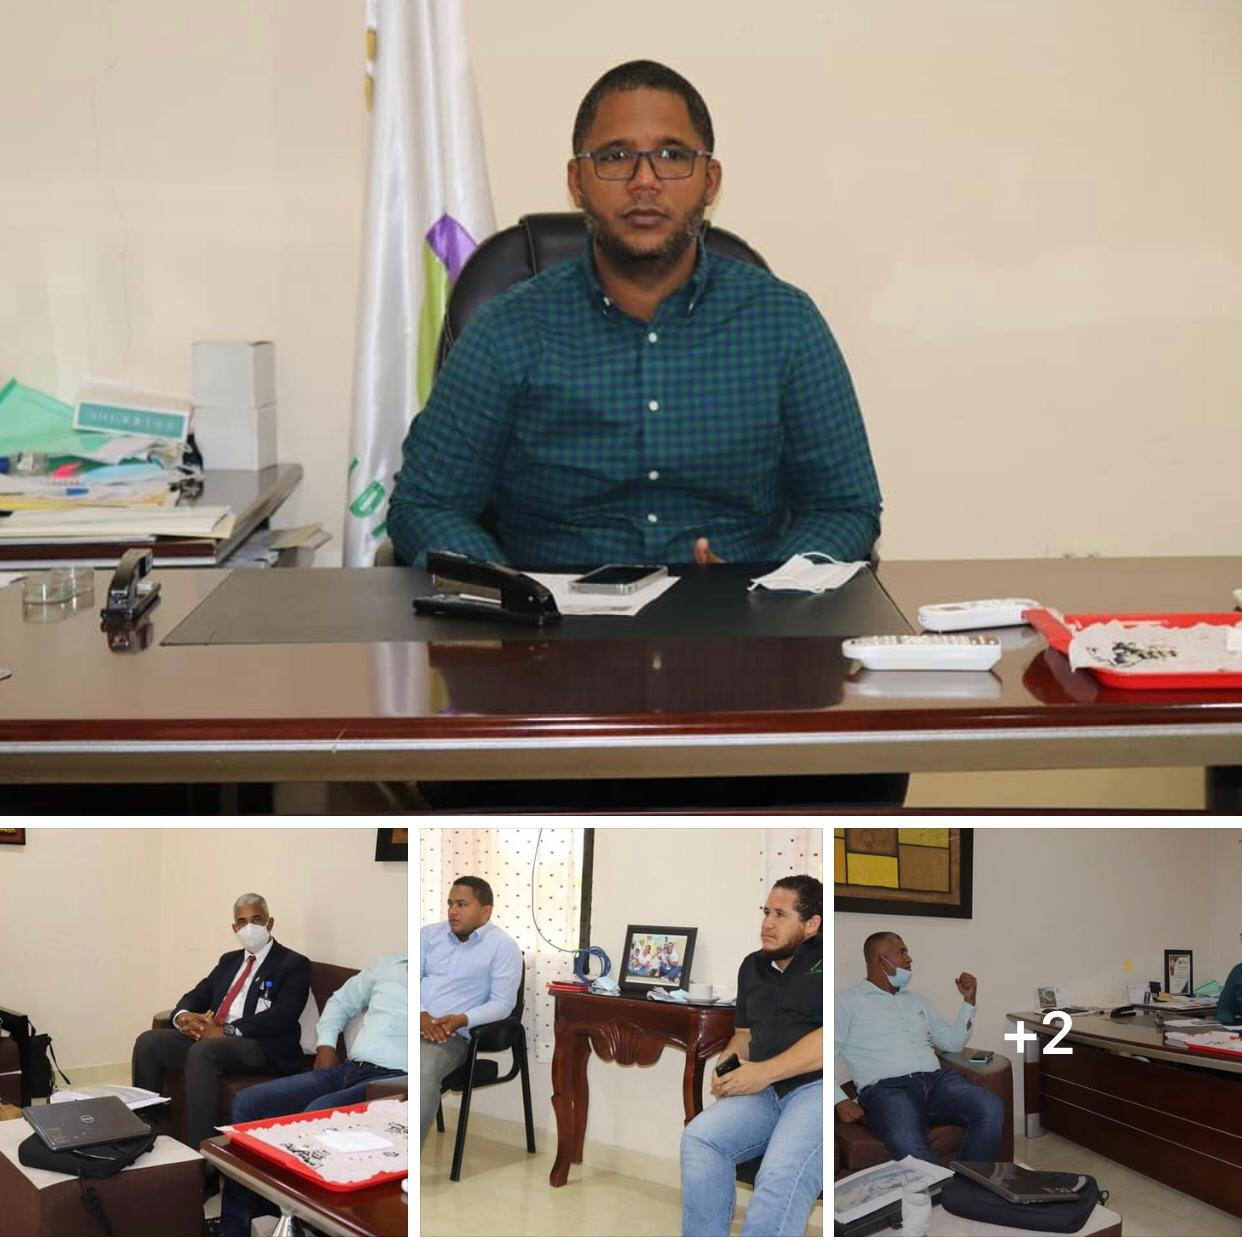 Socializando junto a técnicos del ministerio de economía